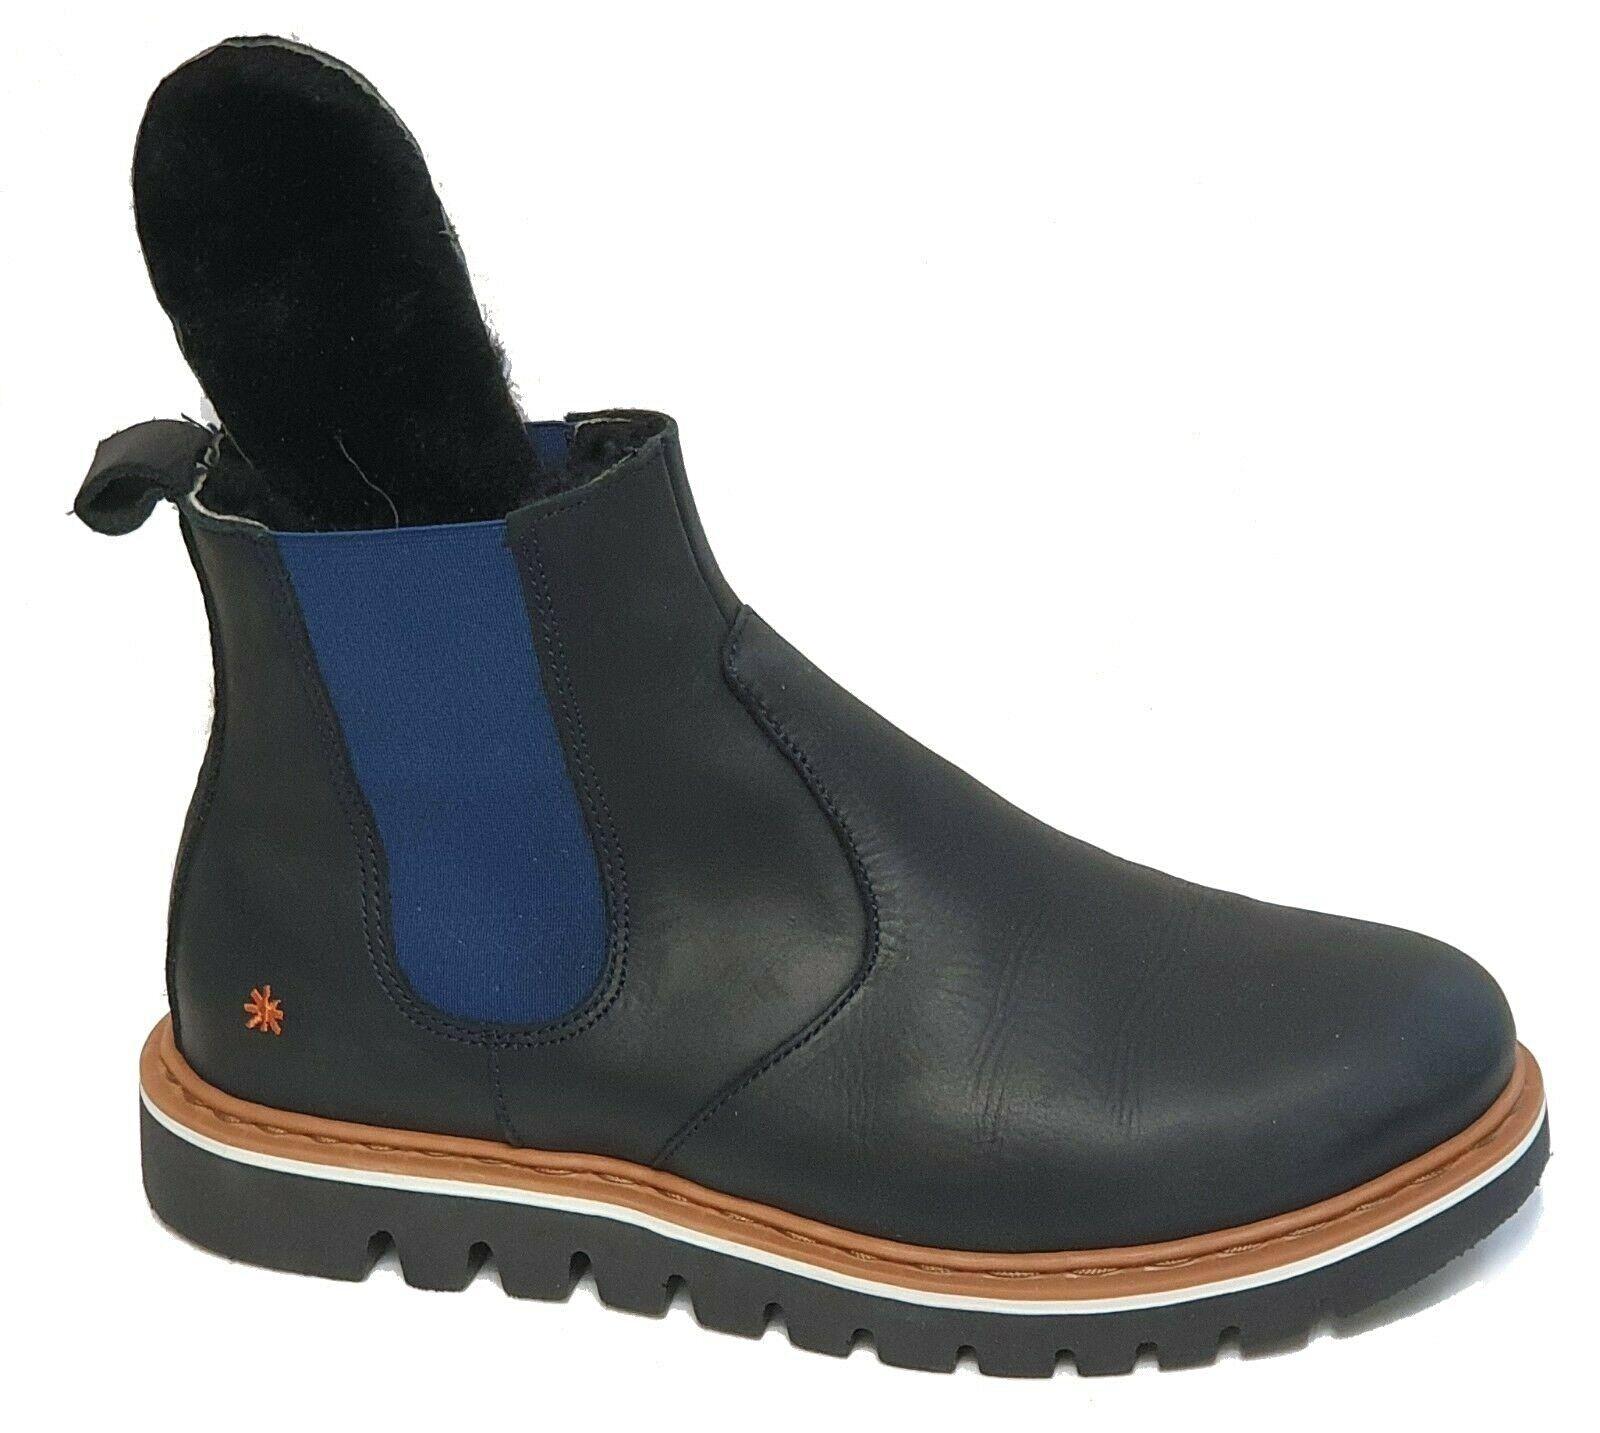 Art Company chelsea bota 1405 toronto grass negro azul original cuero genuino